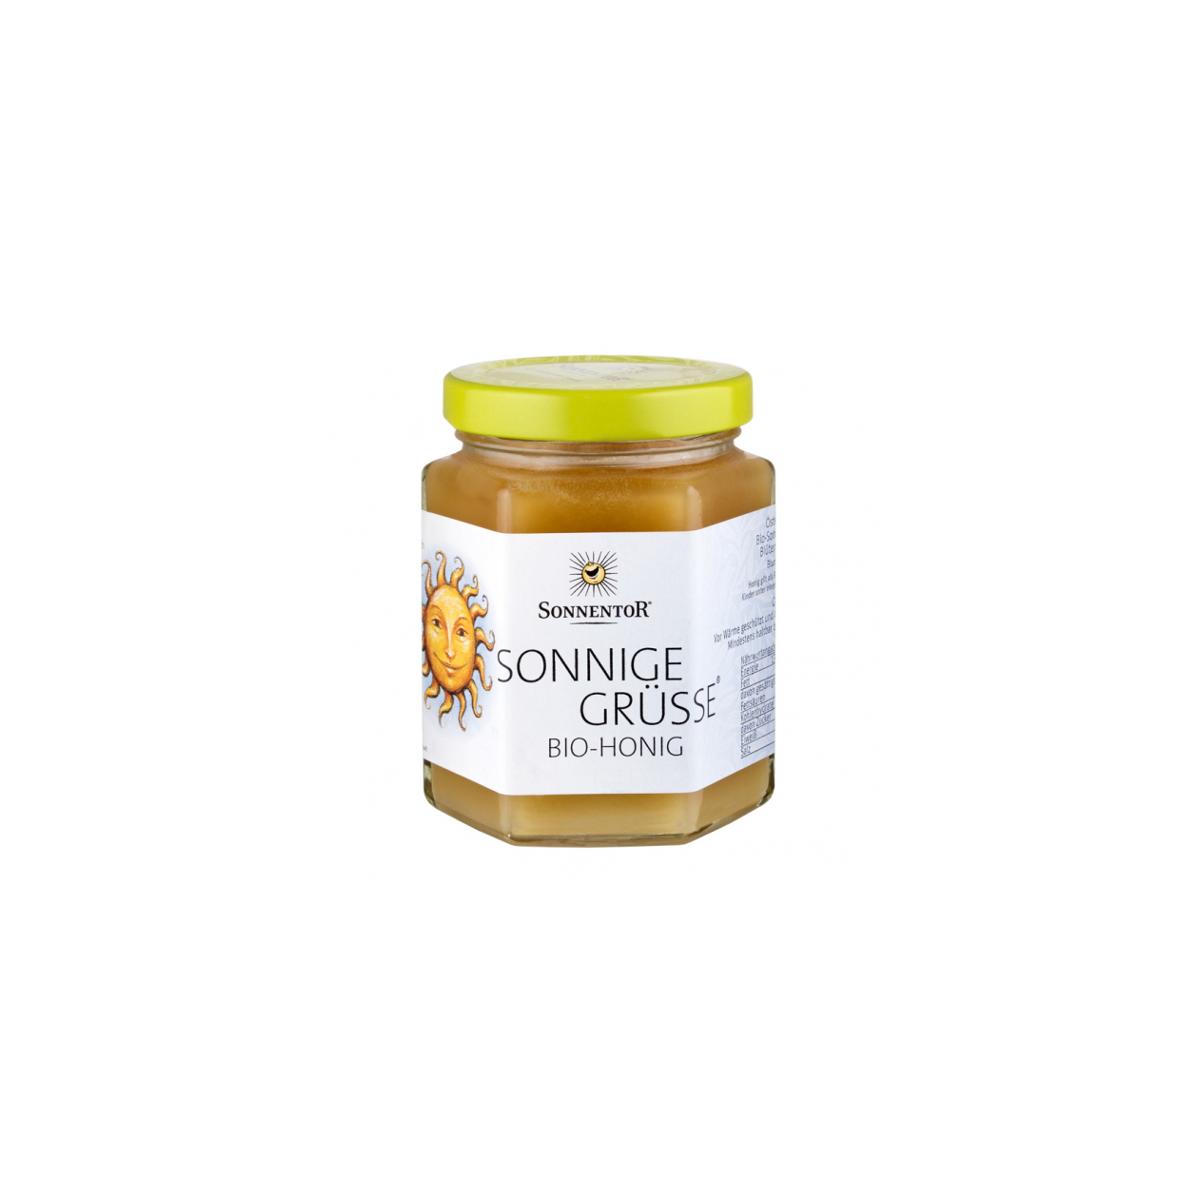 Sonnige Grüsse Honig Sonnentor